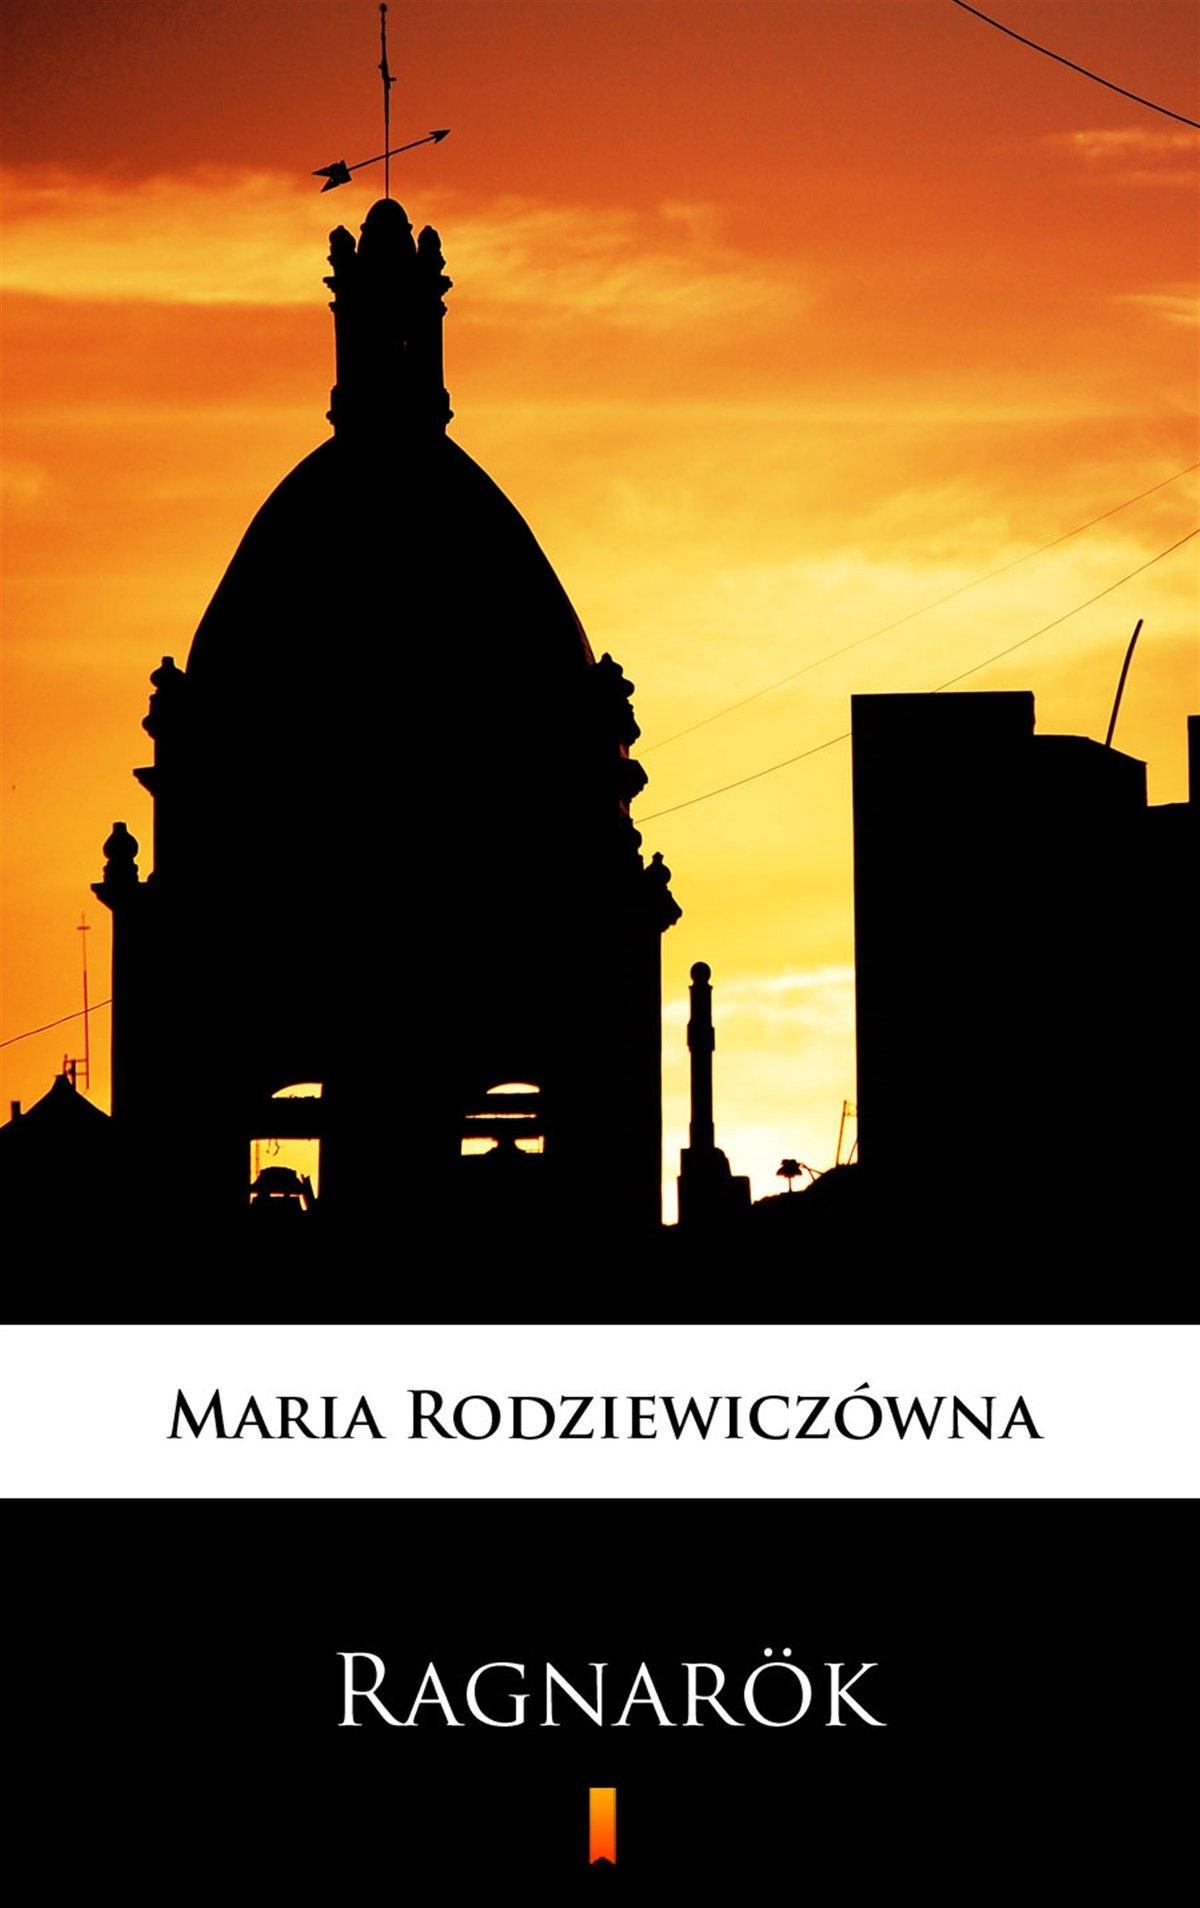 Ragnarok - Ebook (Książka na Kindle) do pobrania w formacie MOBI